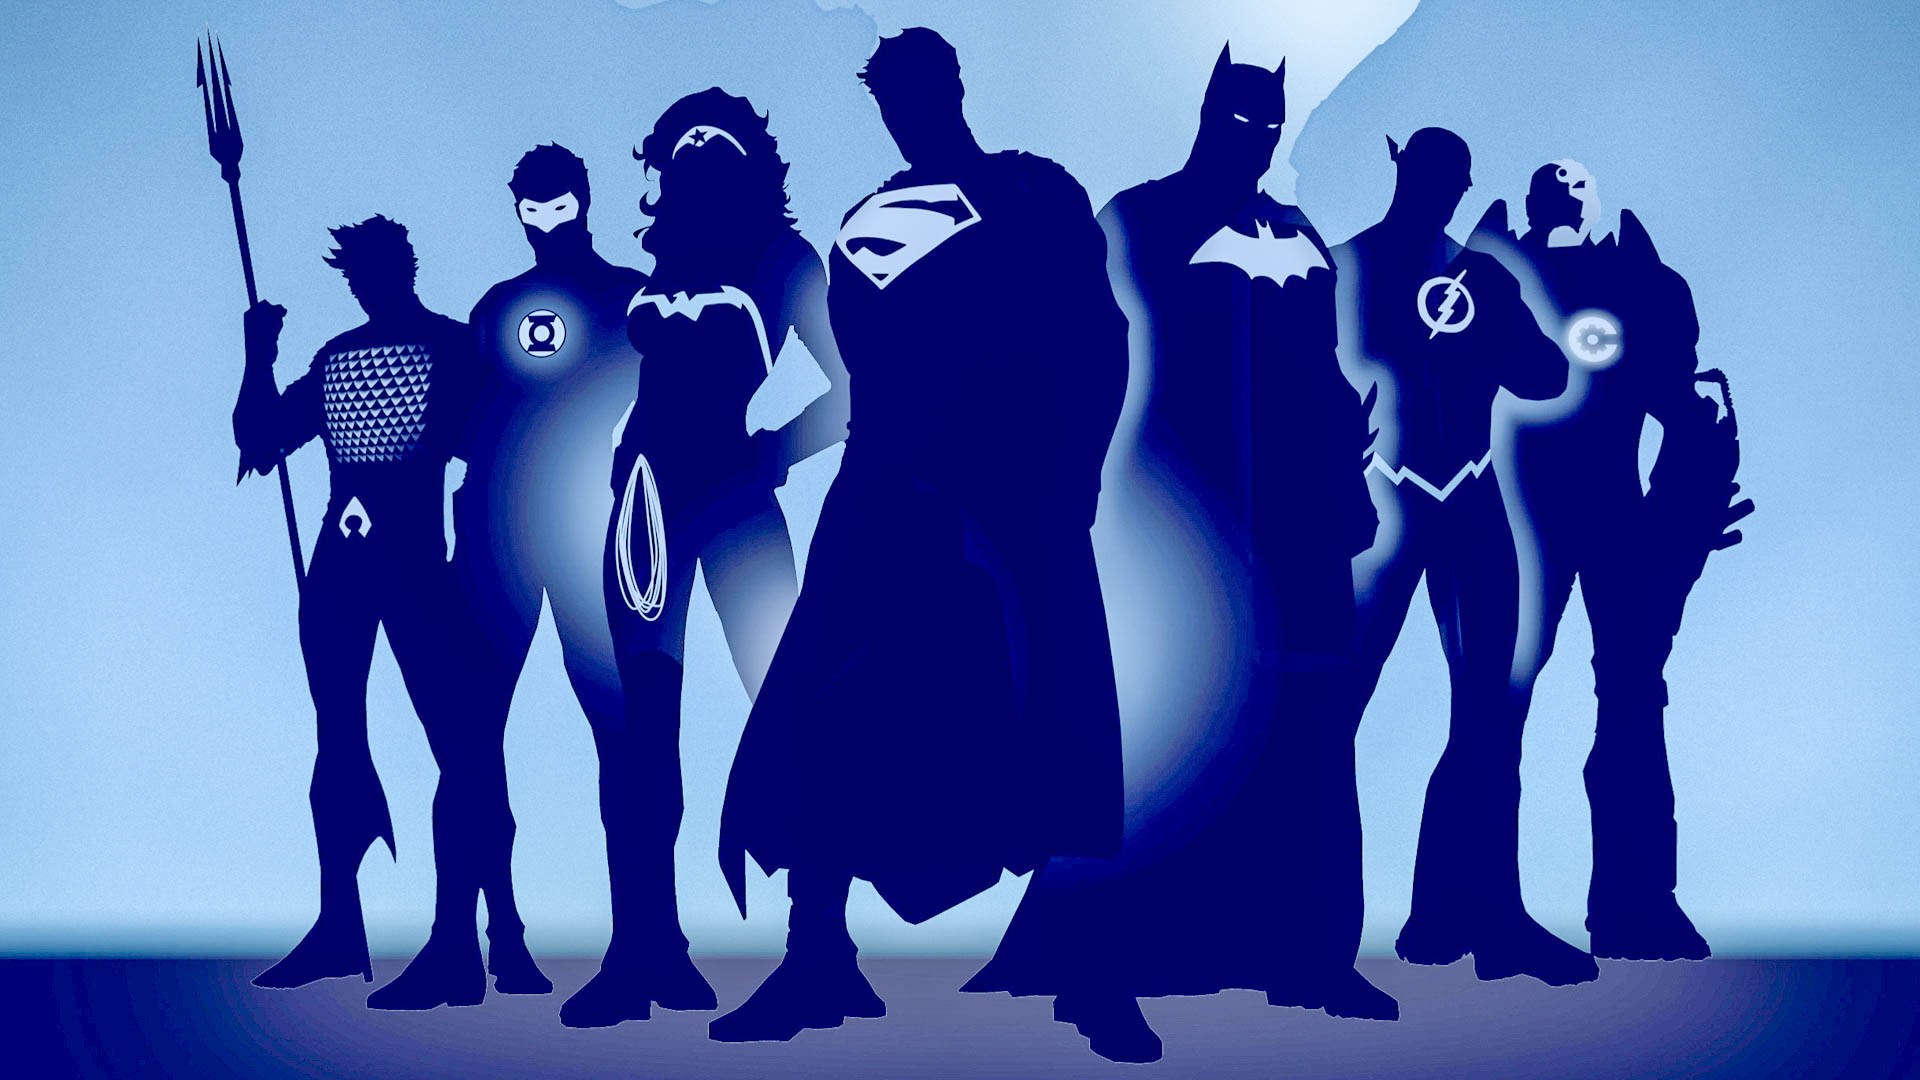 Justiceleaguewallpaper Justiceleaguewallpaper Justice League Hd